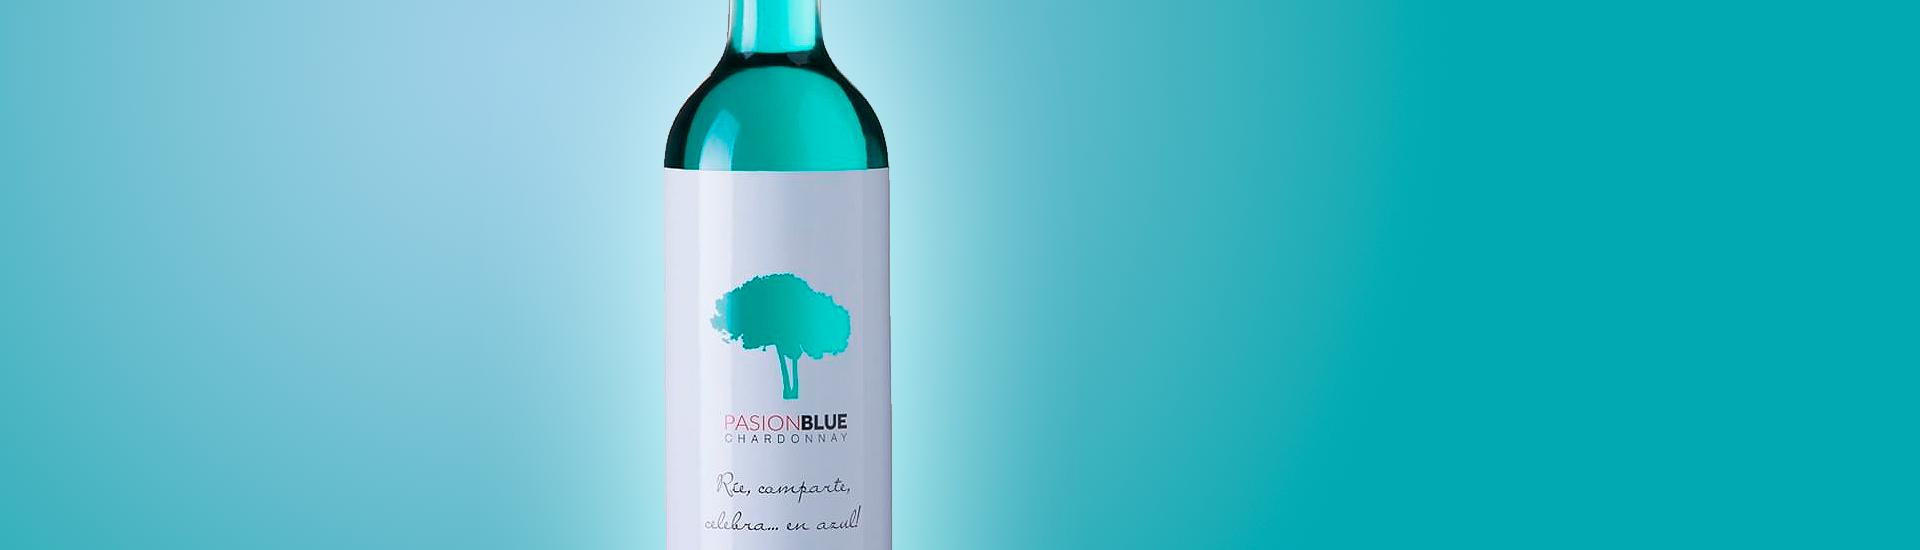 PASION BLUE  - VINO AZUL - VINO